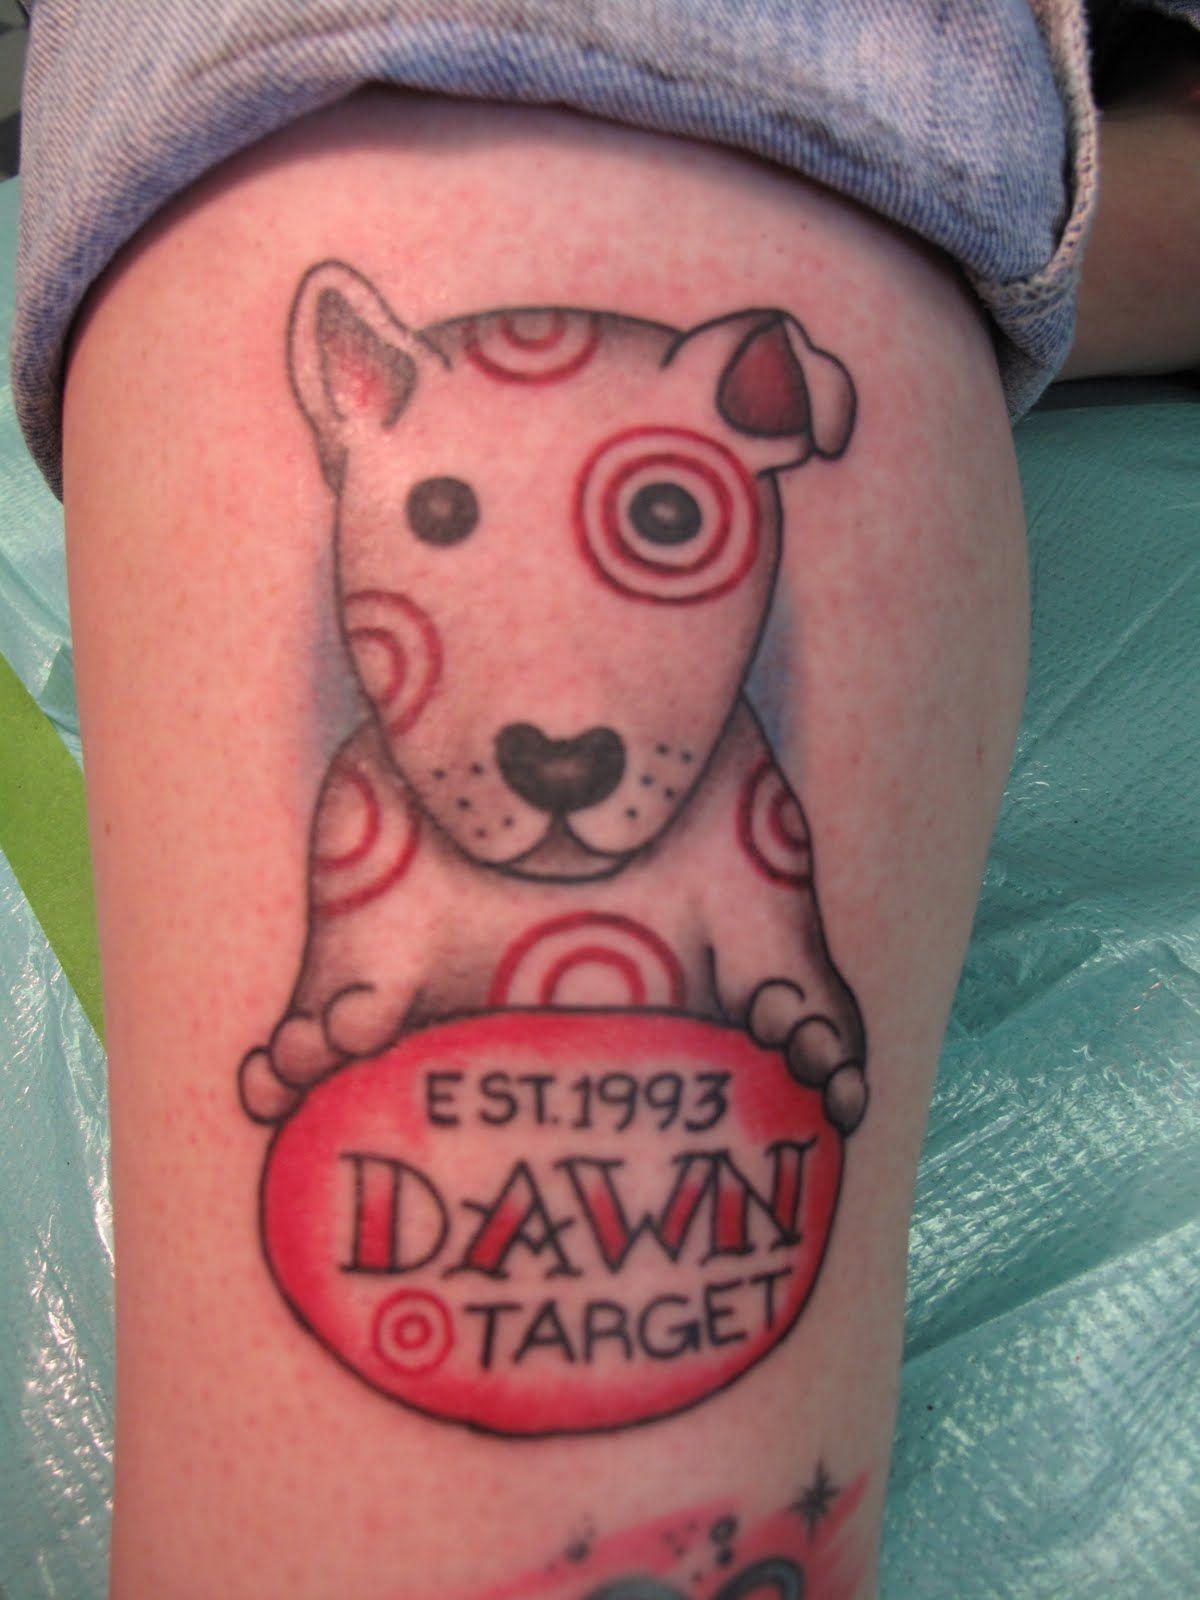 Est 1993 Tattoo Designs : tattoo, designs, Target!, Tattoo, Designs,, Tattoos,, Arrow